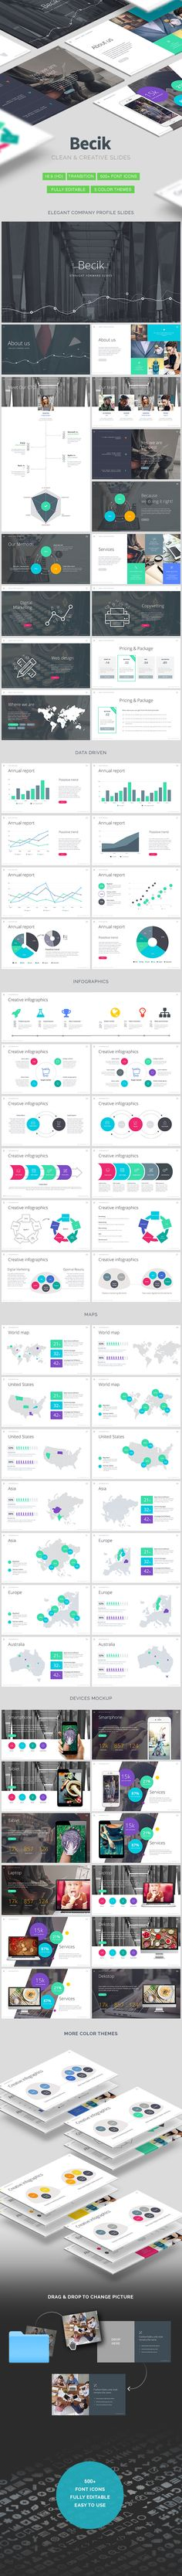 Becik - Creative Keynote Template #slides #design Download: http://graphicriver.net/item/becik-creative-keynote-template/14222328?ref=ksioks